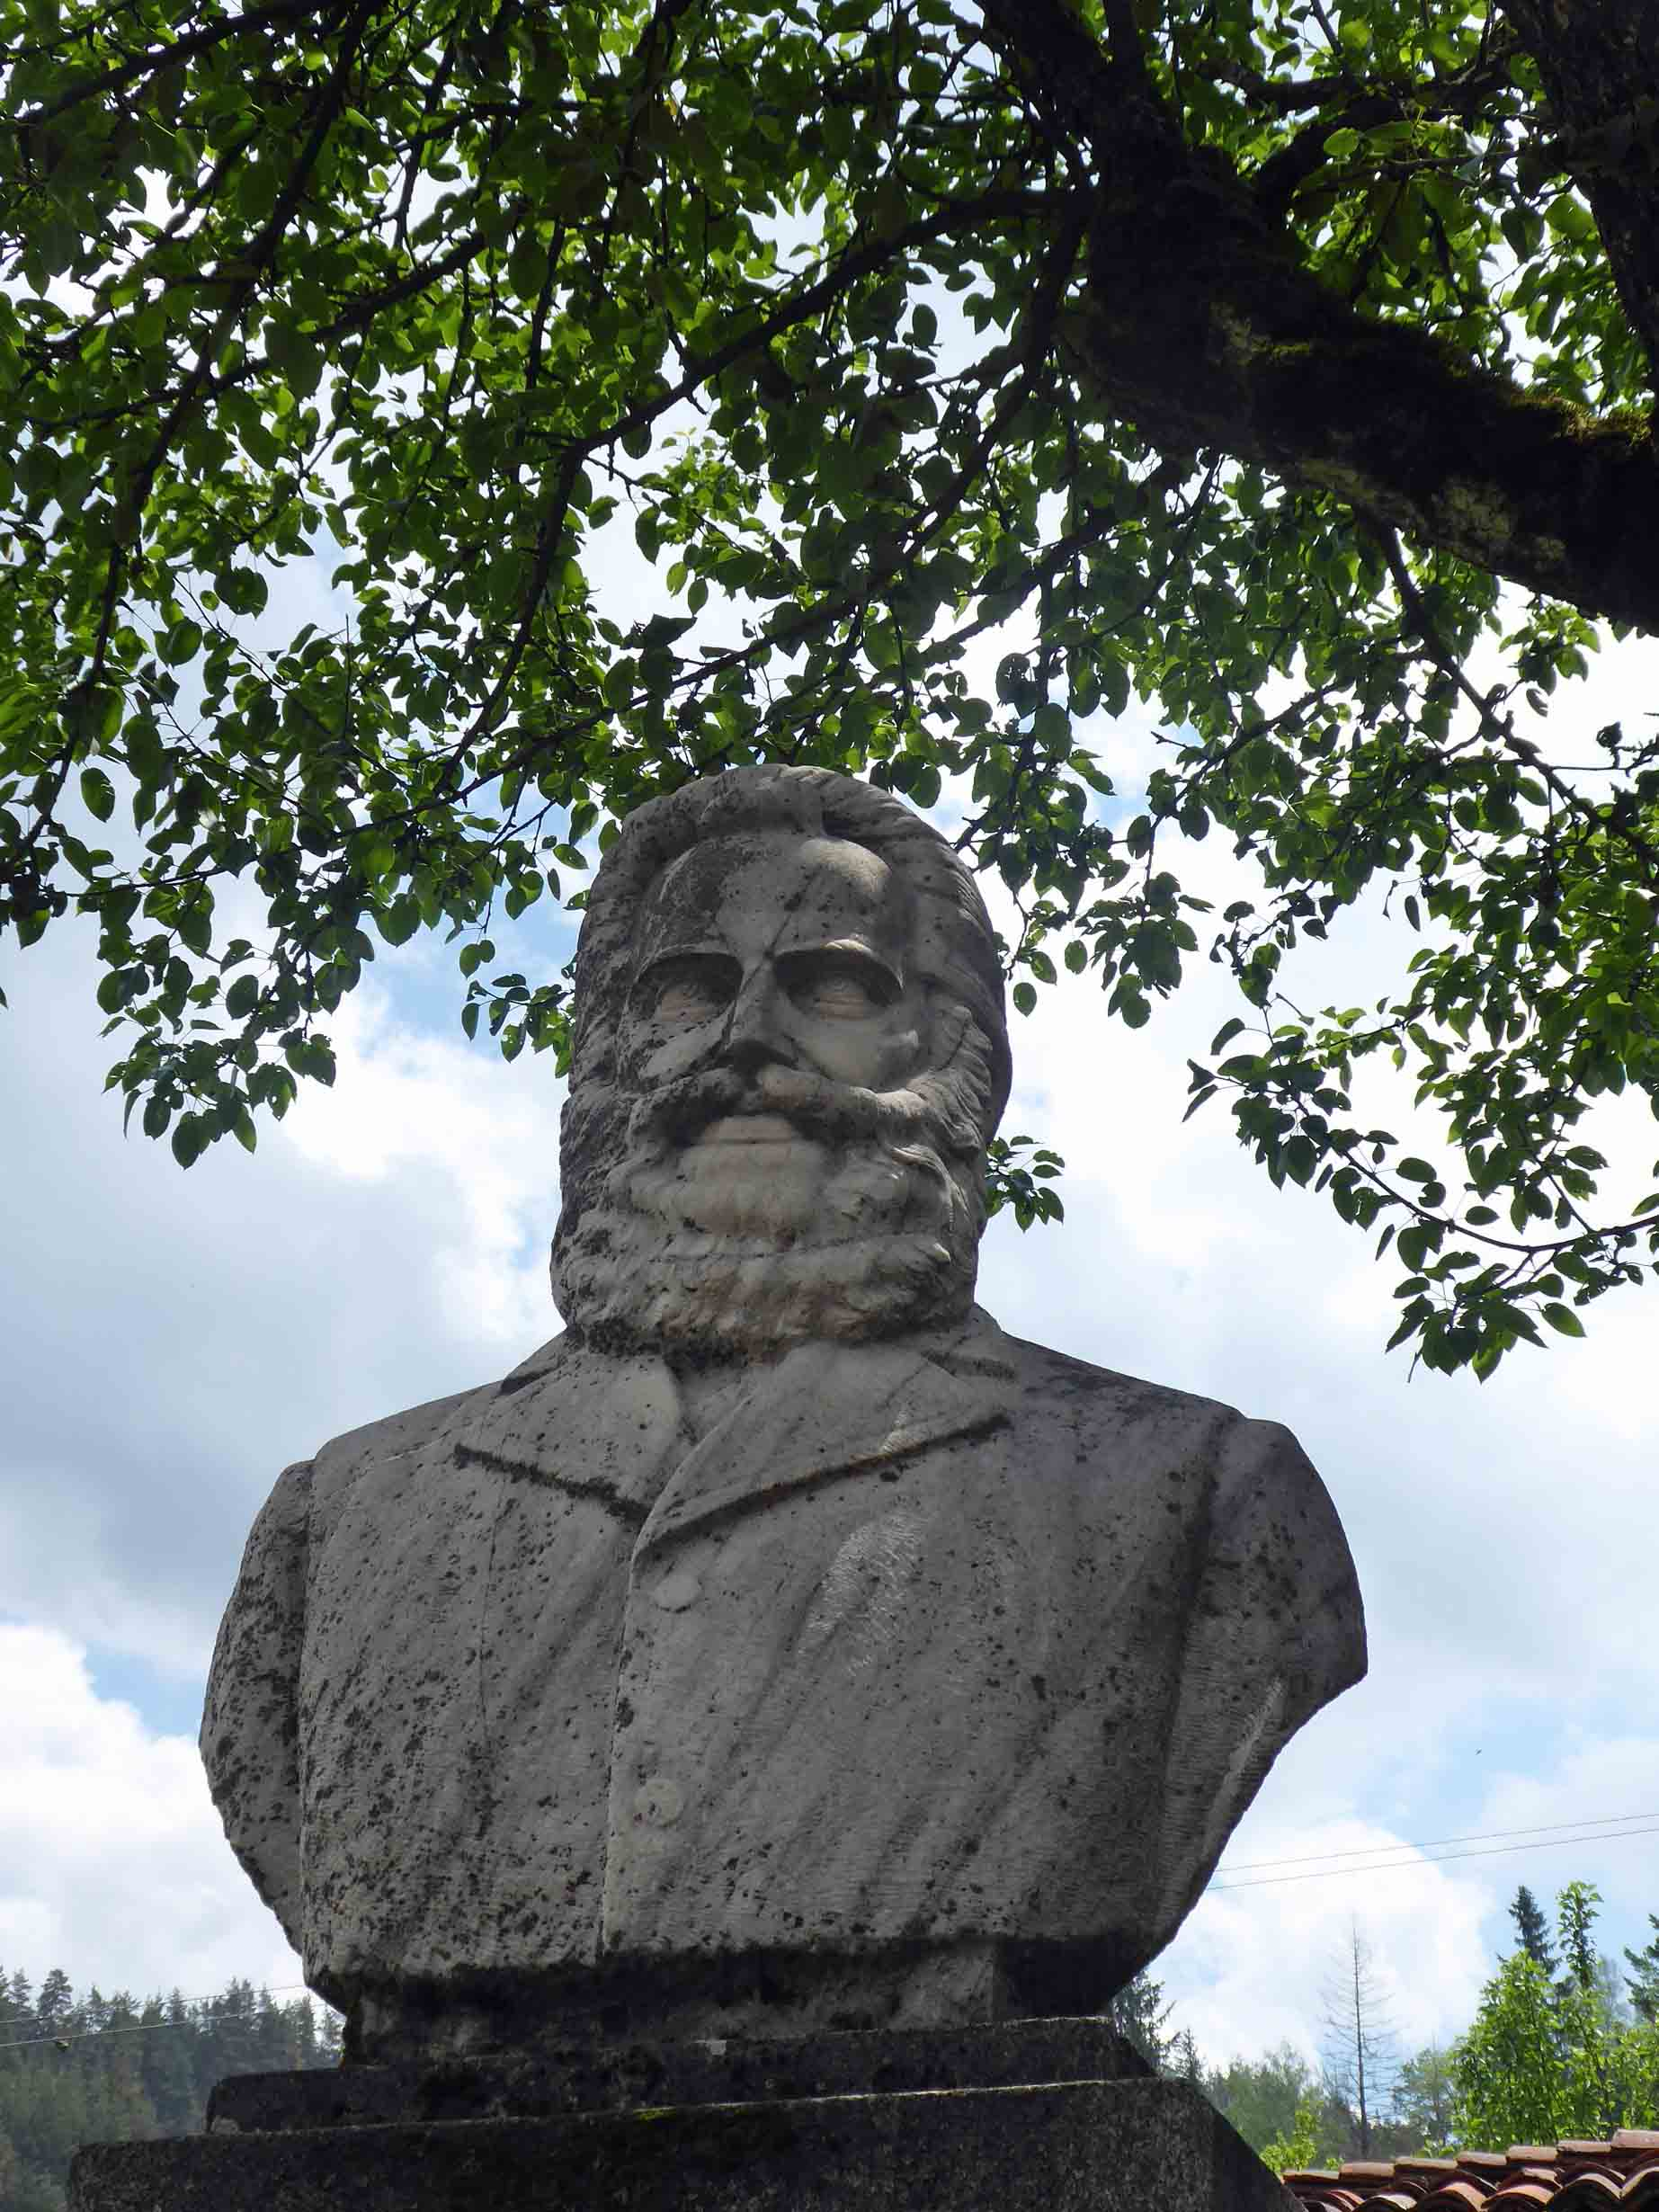 Stone bust of bearded man